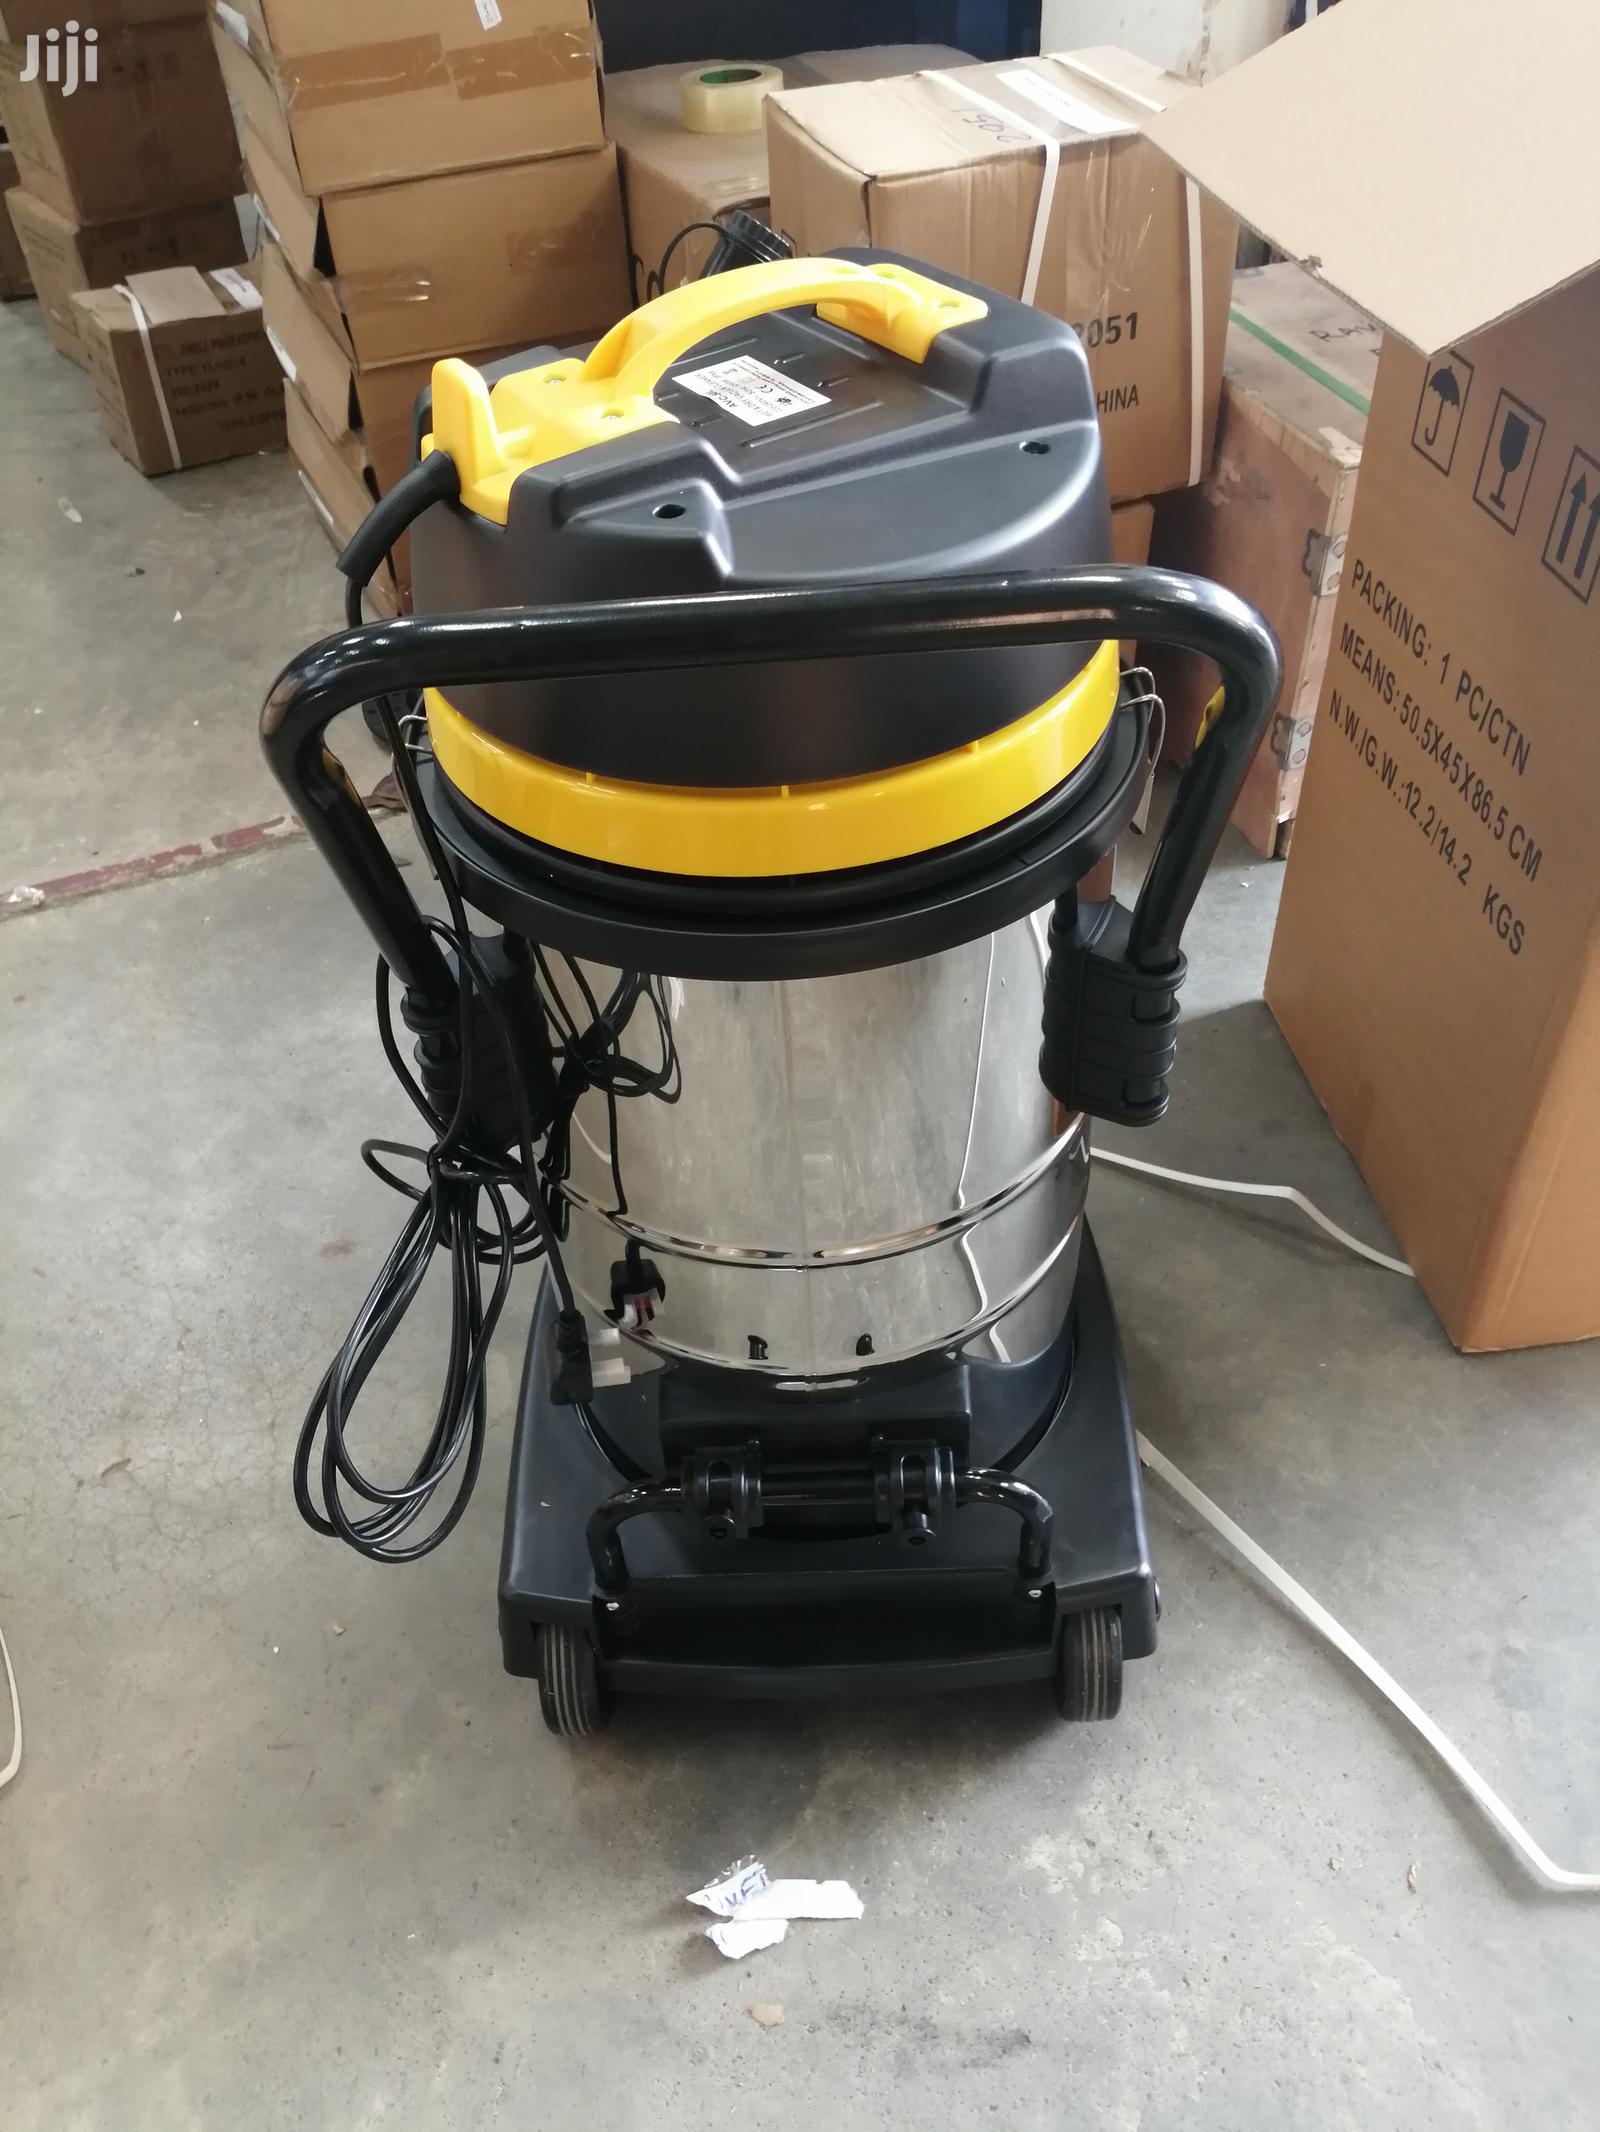 50l Wet Dry Vacuum Cleaner | Home Appliances for sale in Tononoka, Mombasa, Kenya